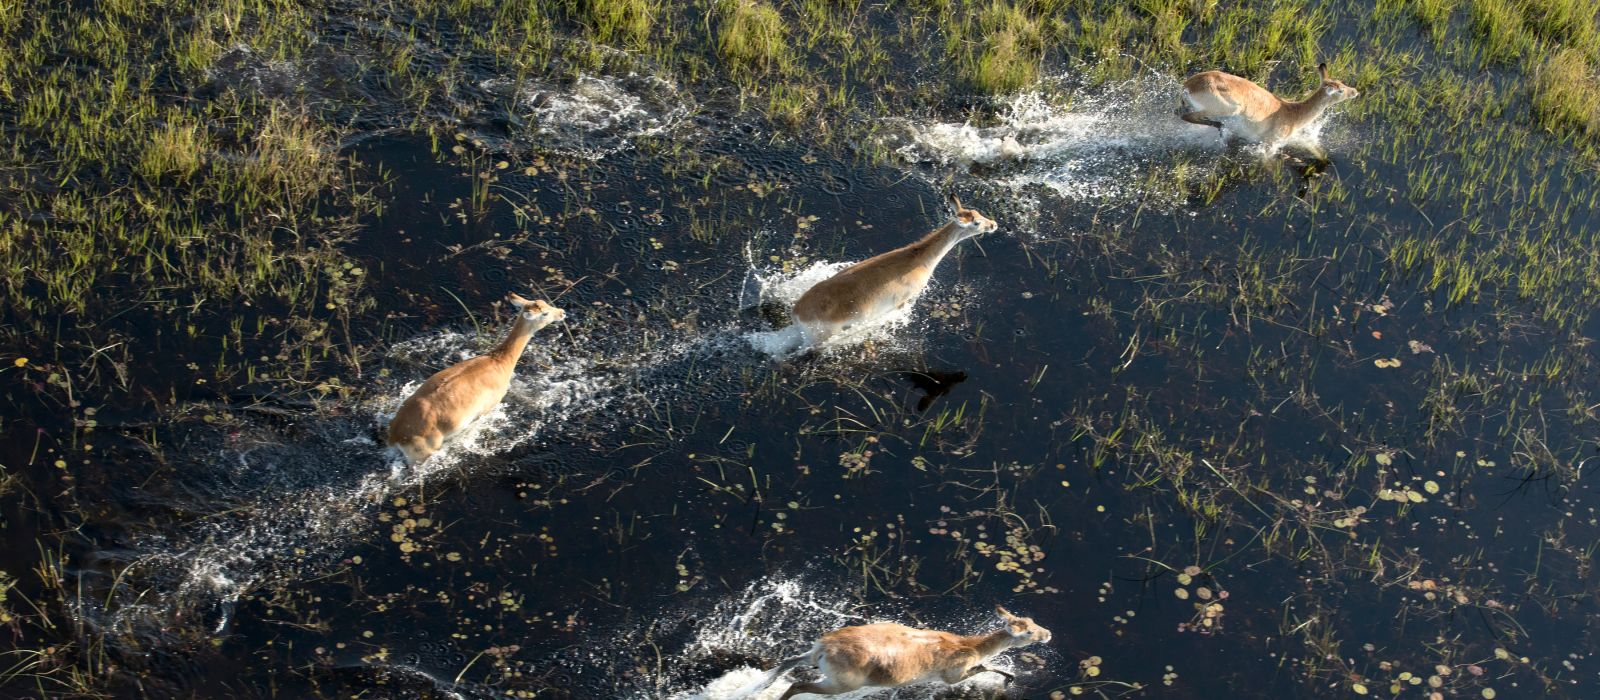 Red lechwe running in the okavango delta, Botswana, Africa